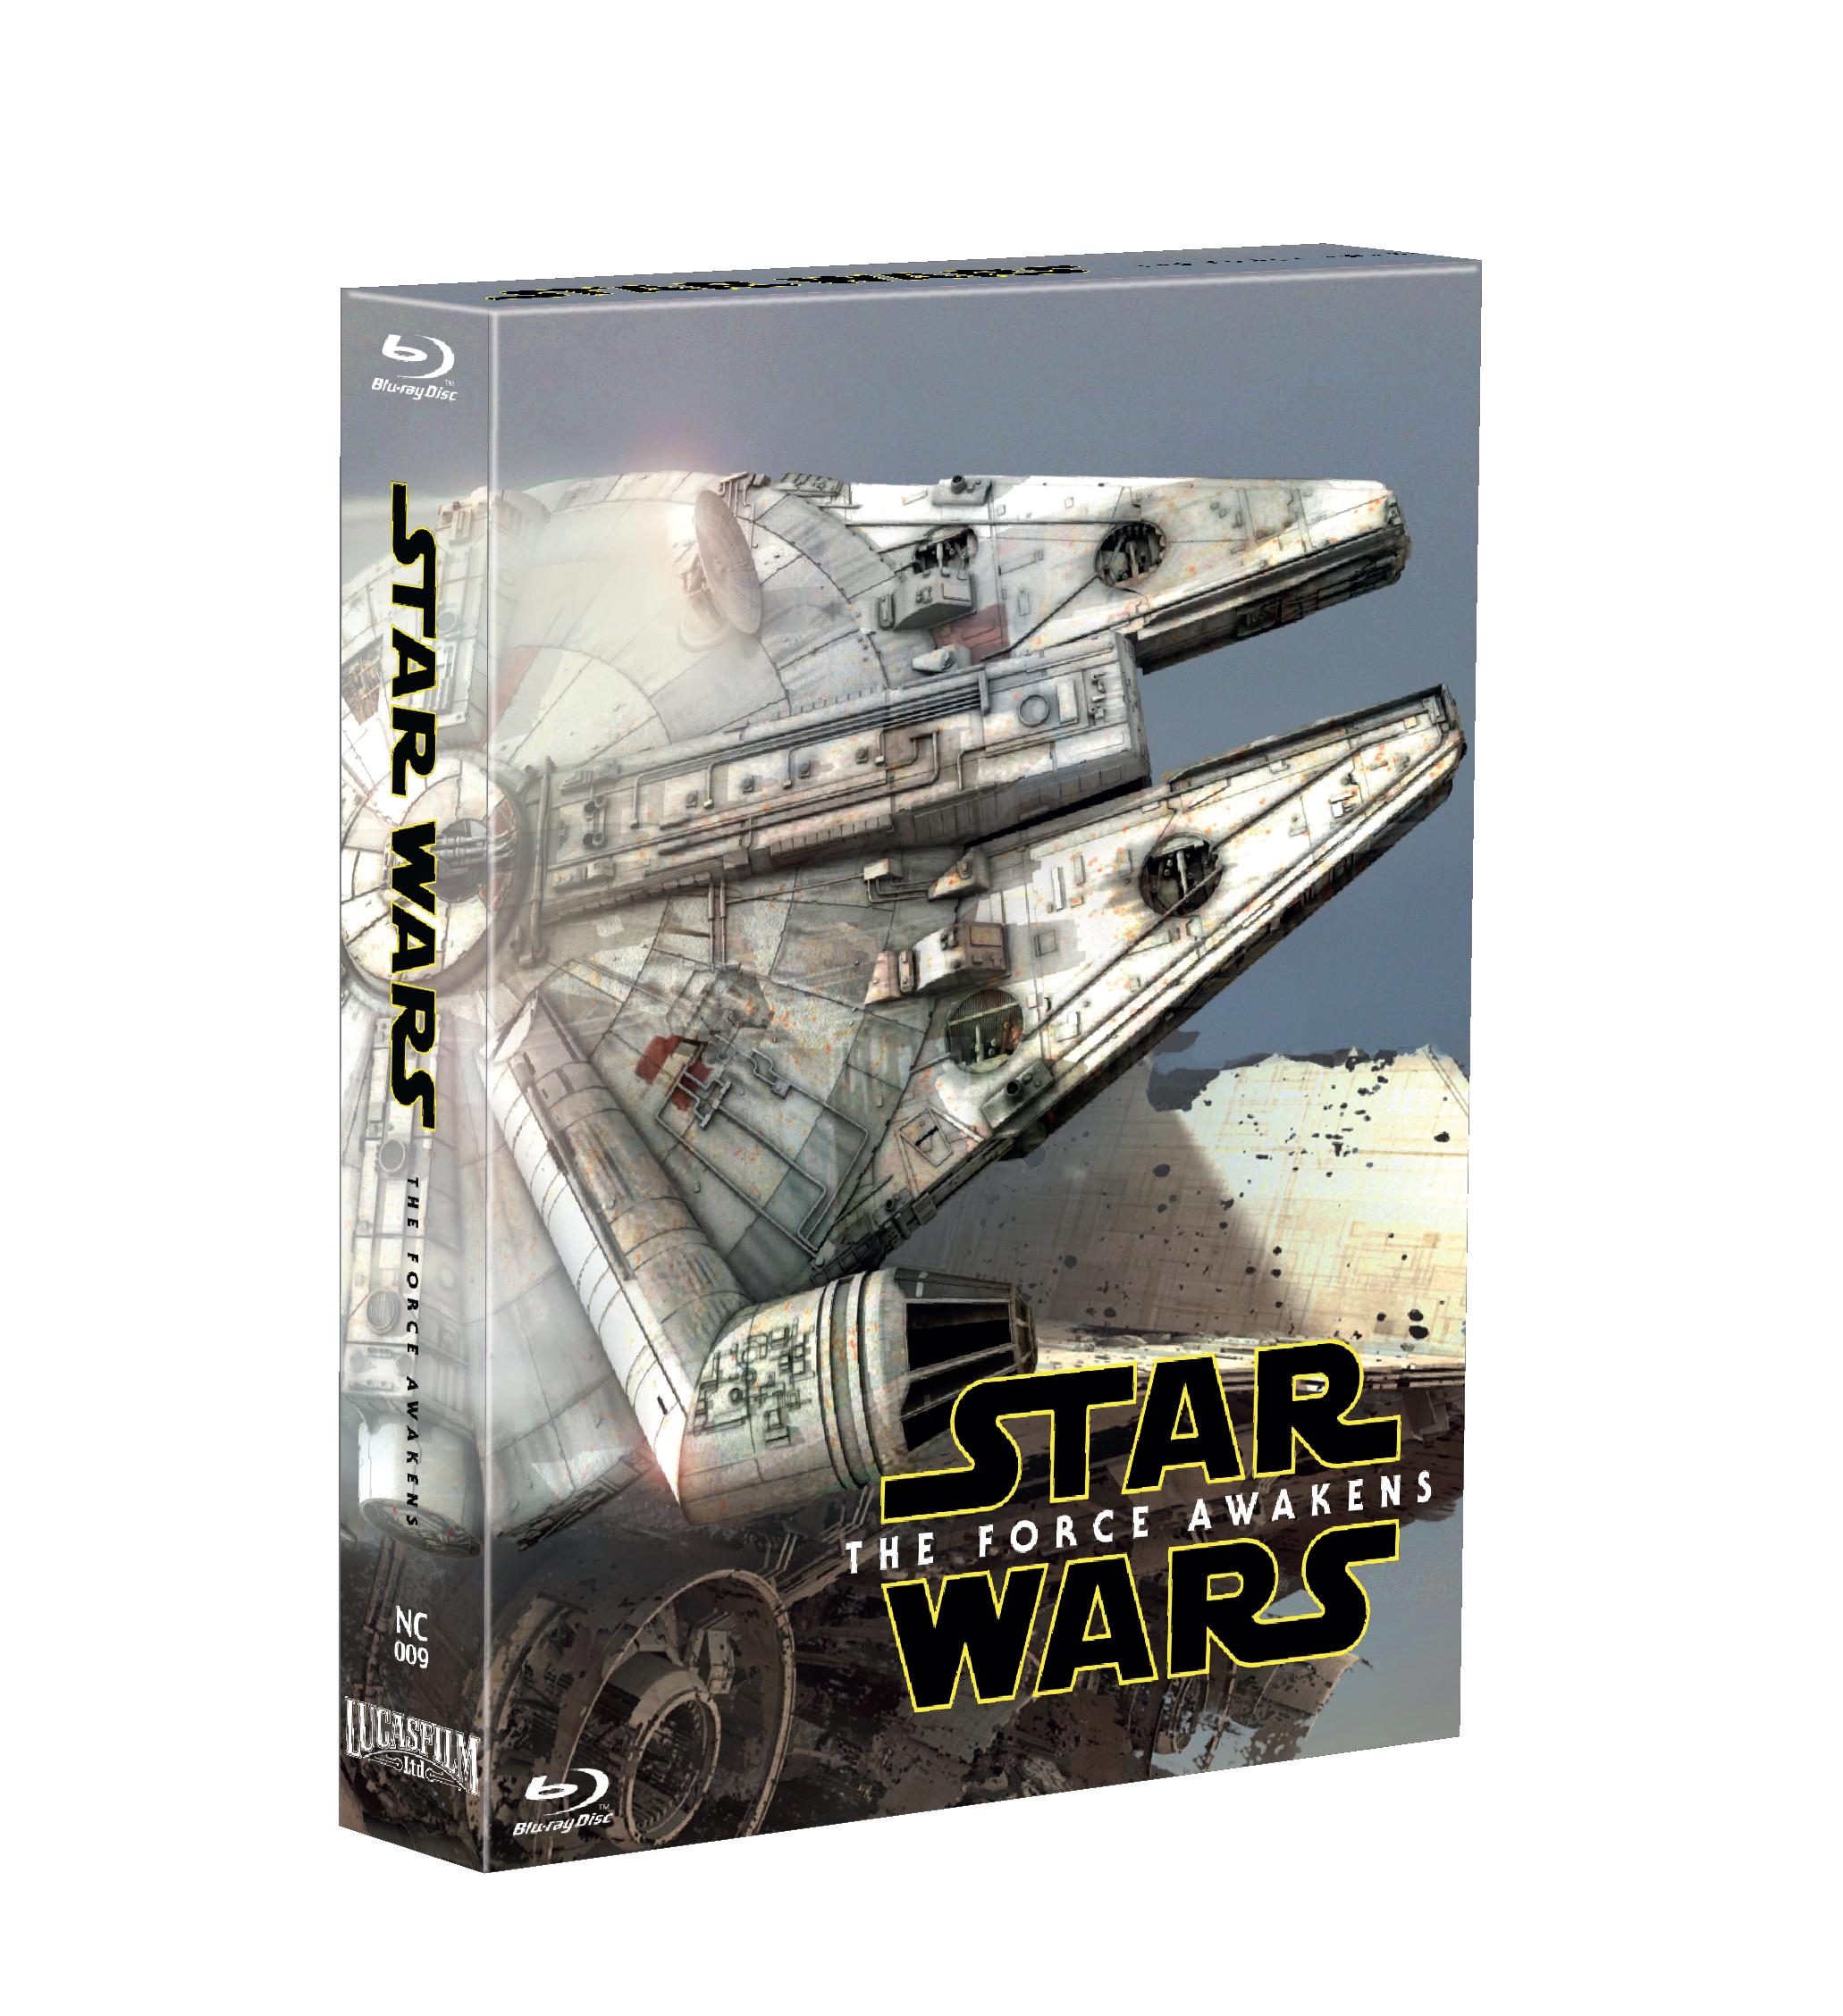 STAR WARS: EPISODE VII - THE FORCE AWAKENS STEELBOOK FULL SLIP-B(LIMITED 200 COPIES) NC#9